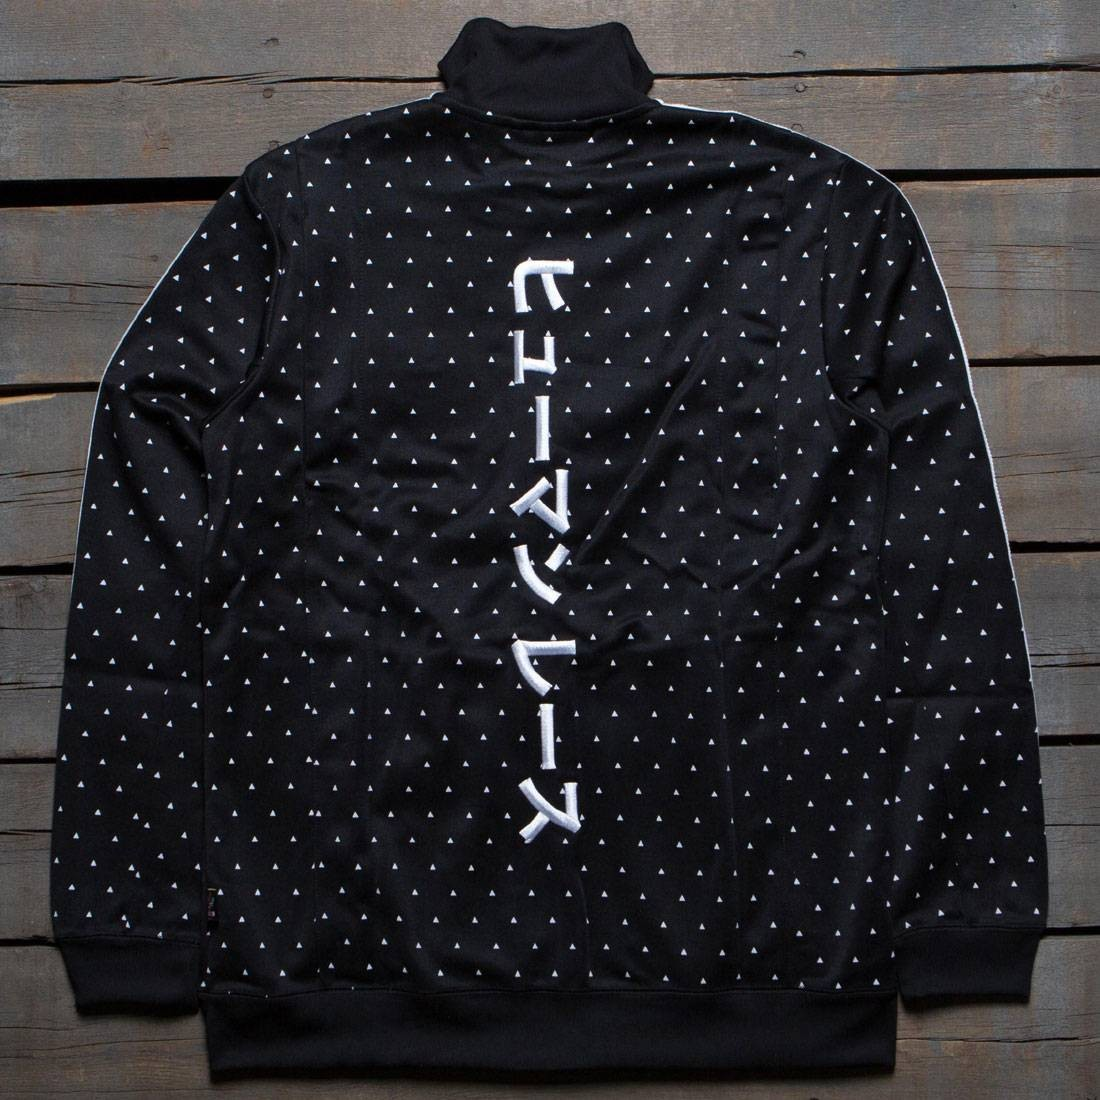 4fc9edc26 ... adidas x pharrell williams men hu track jacket (black white)